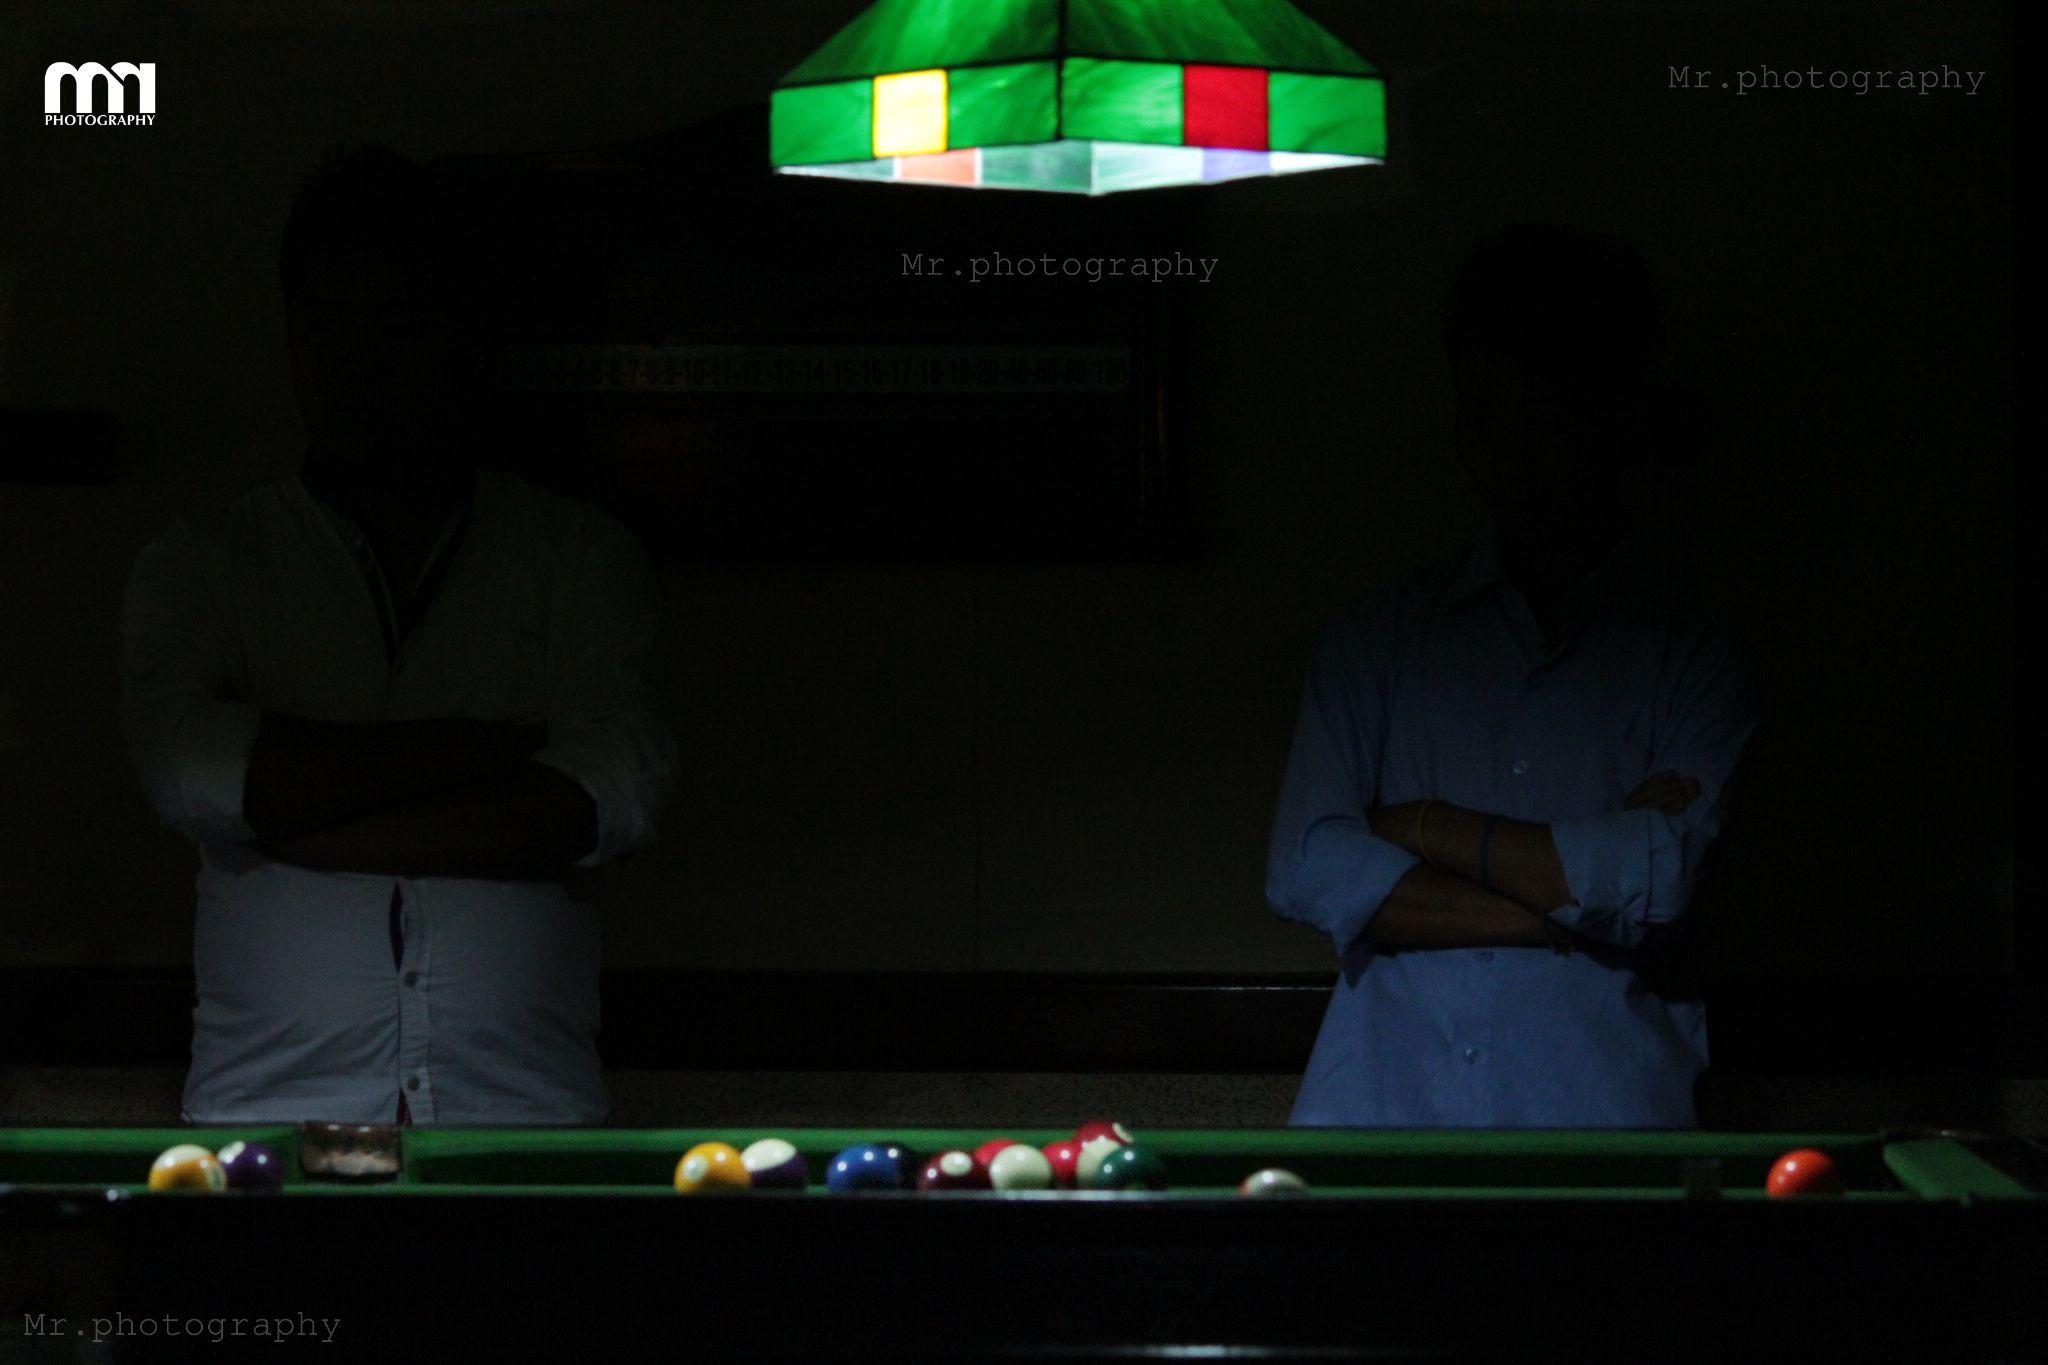 LIGHTS AND BALLS by sanadrahman (Mr.photography mangalore)